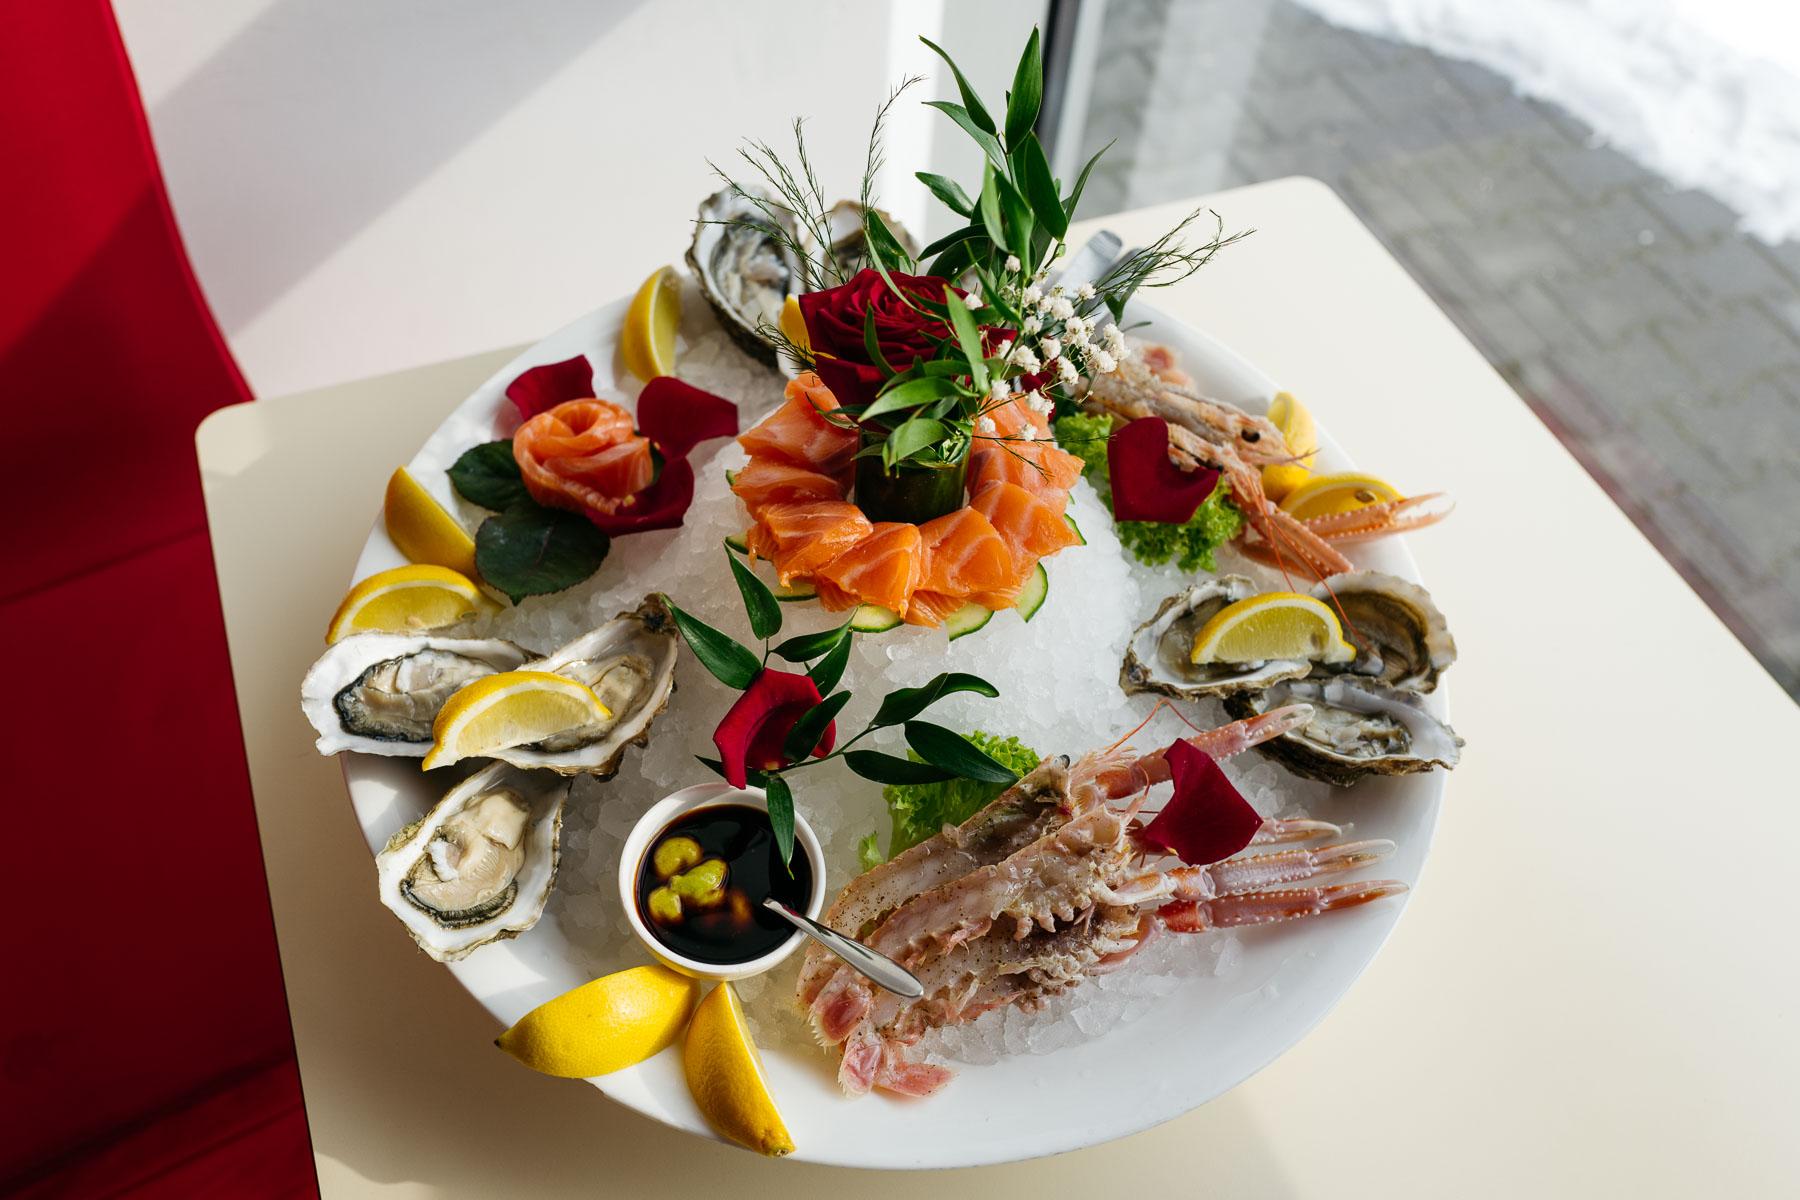 Ostrygi na zimno (sheng hao, 生蚝), łosoś surowy w plastrach (san wen yu, 三文鱼 ), homarzce surowe (xin xi lan xiao long xia, 新西兰小龙虾)